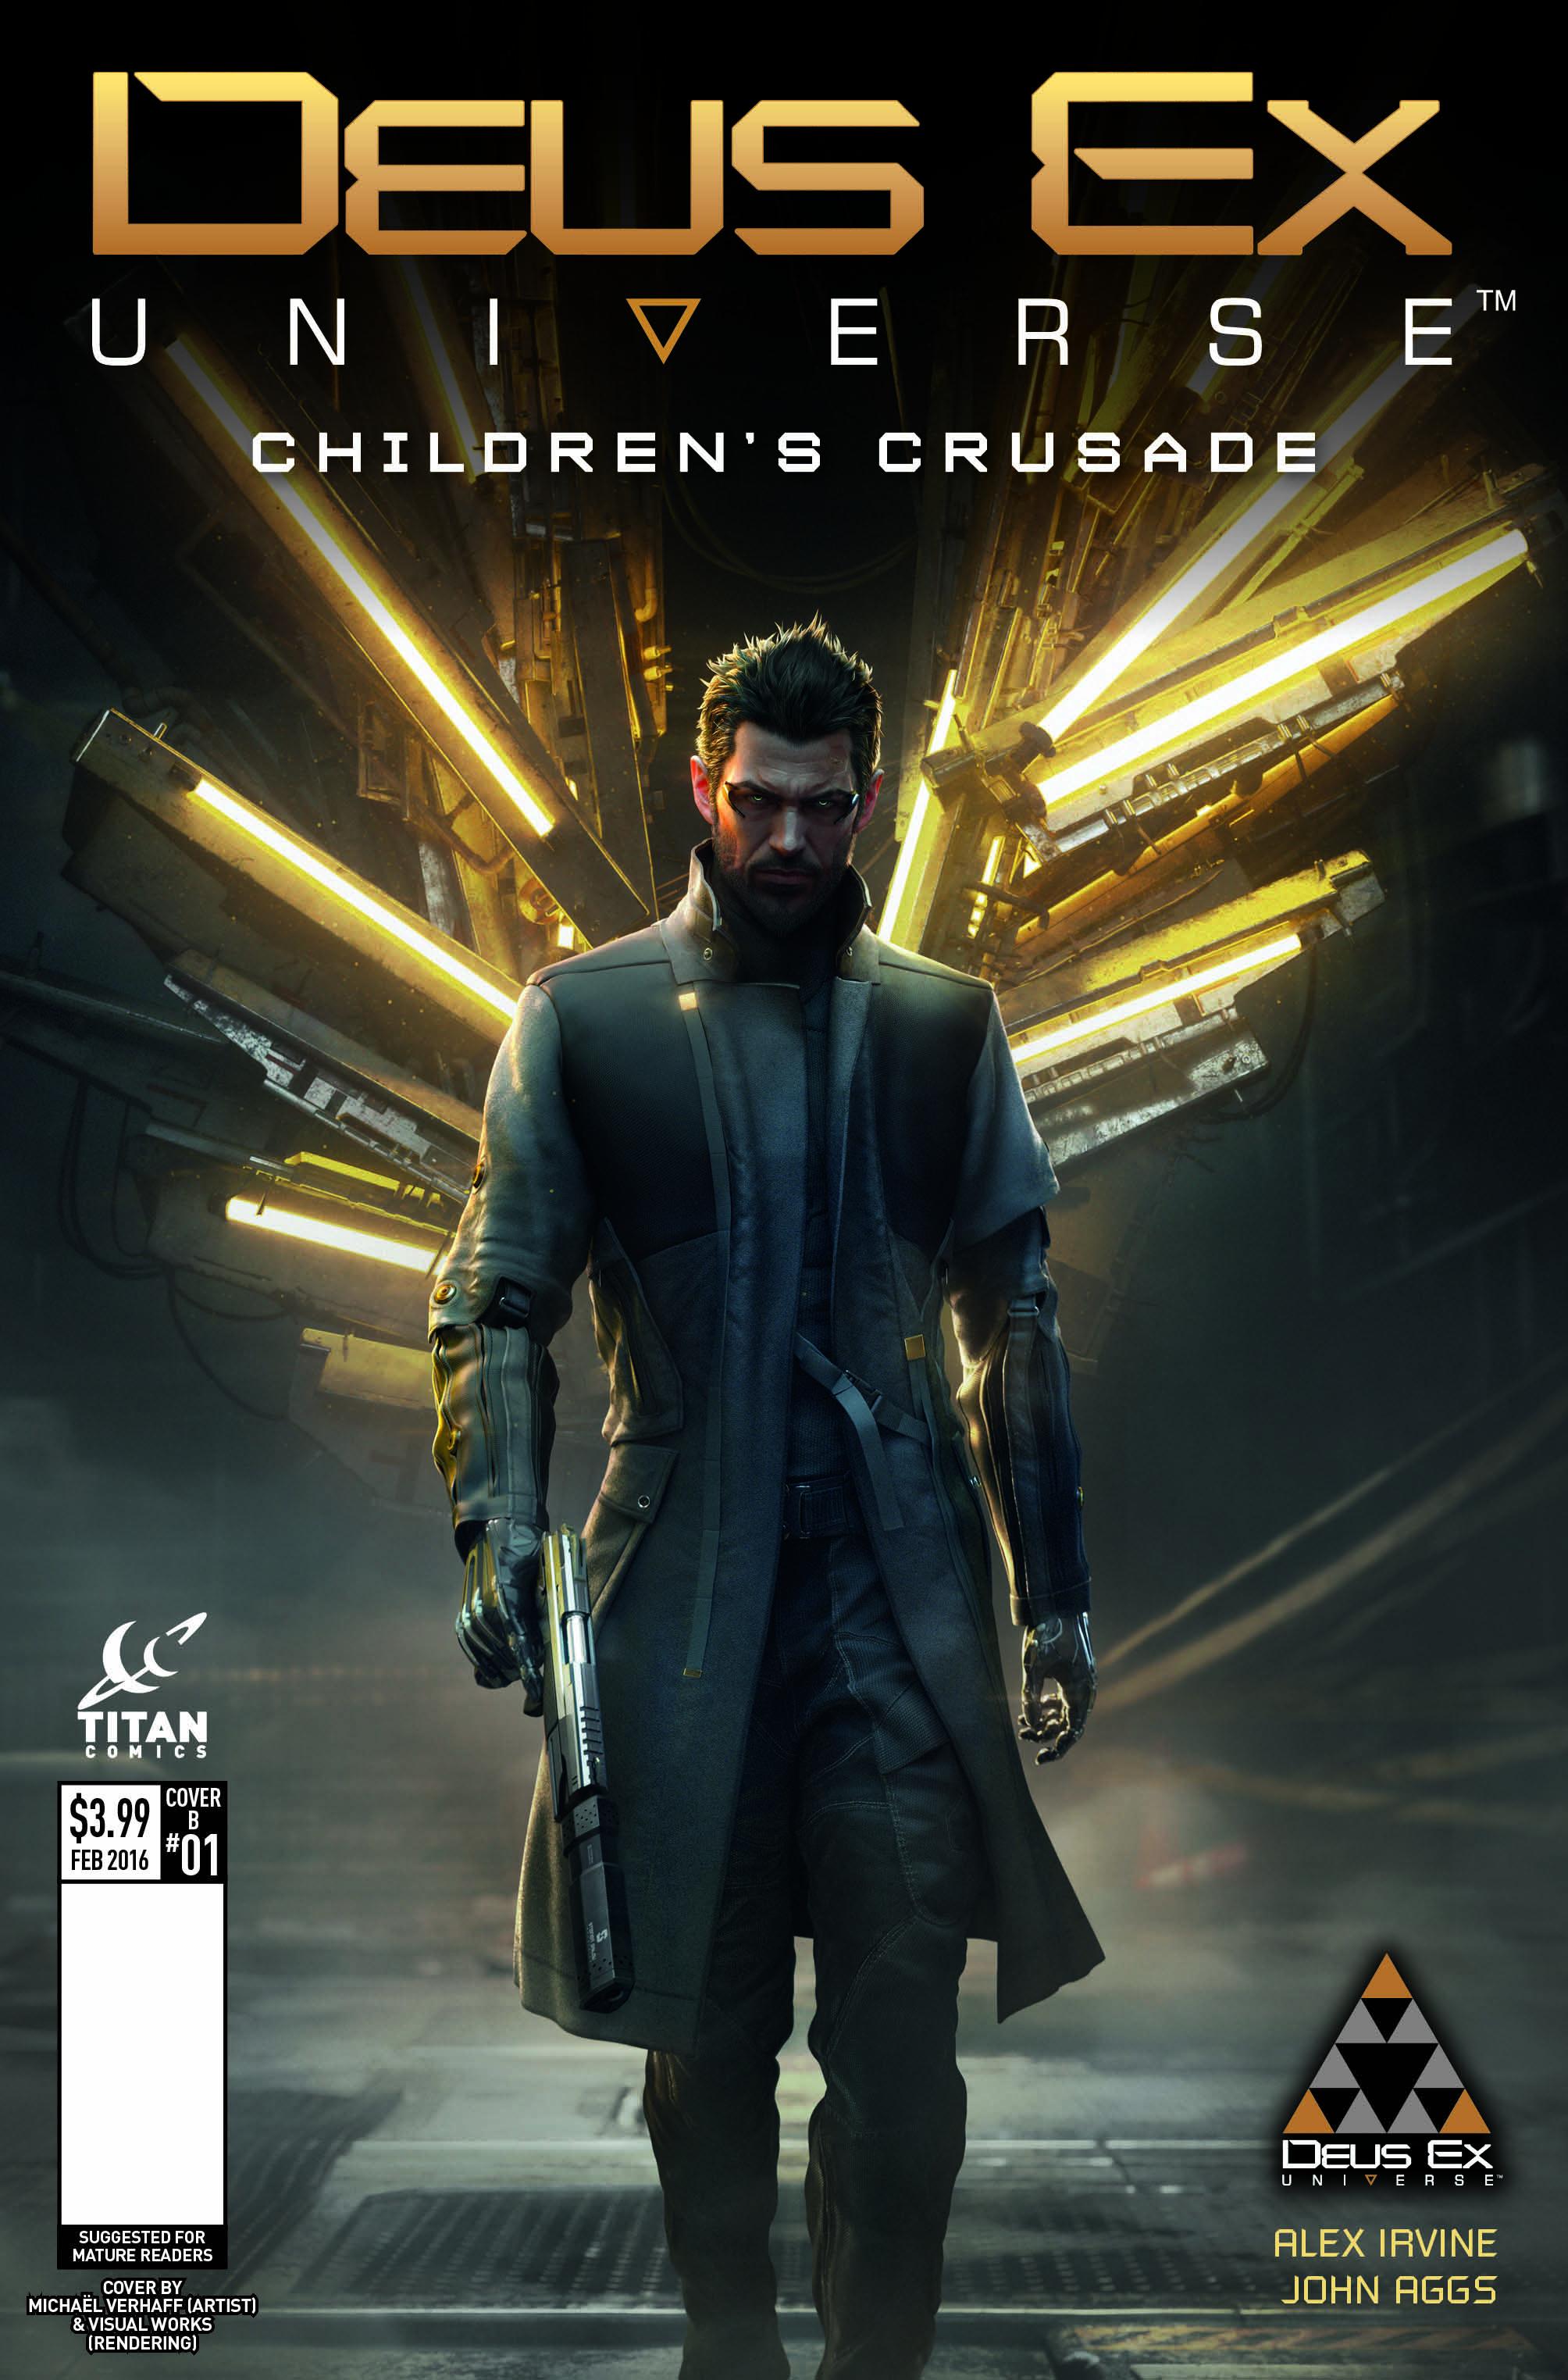 Deus Ex #1 Covers Debuted By Titan